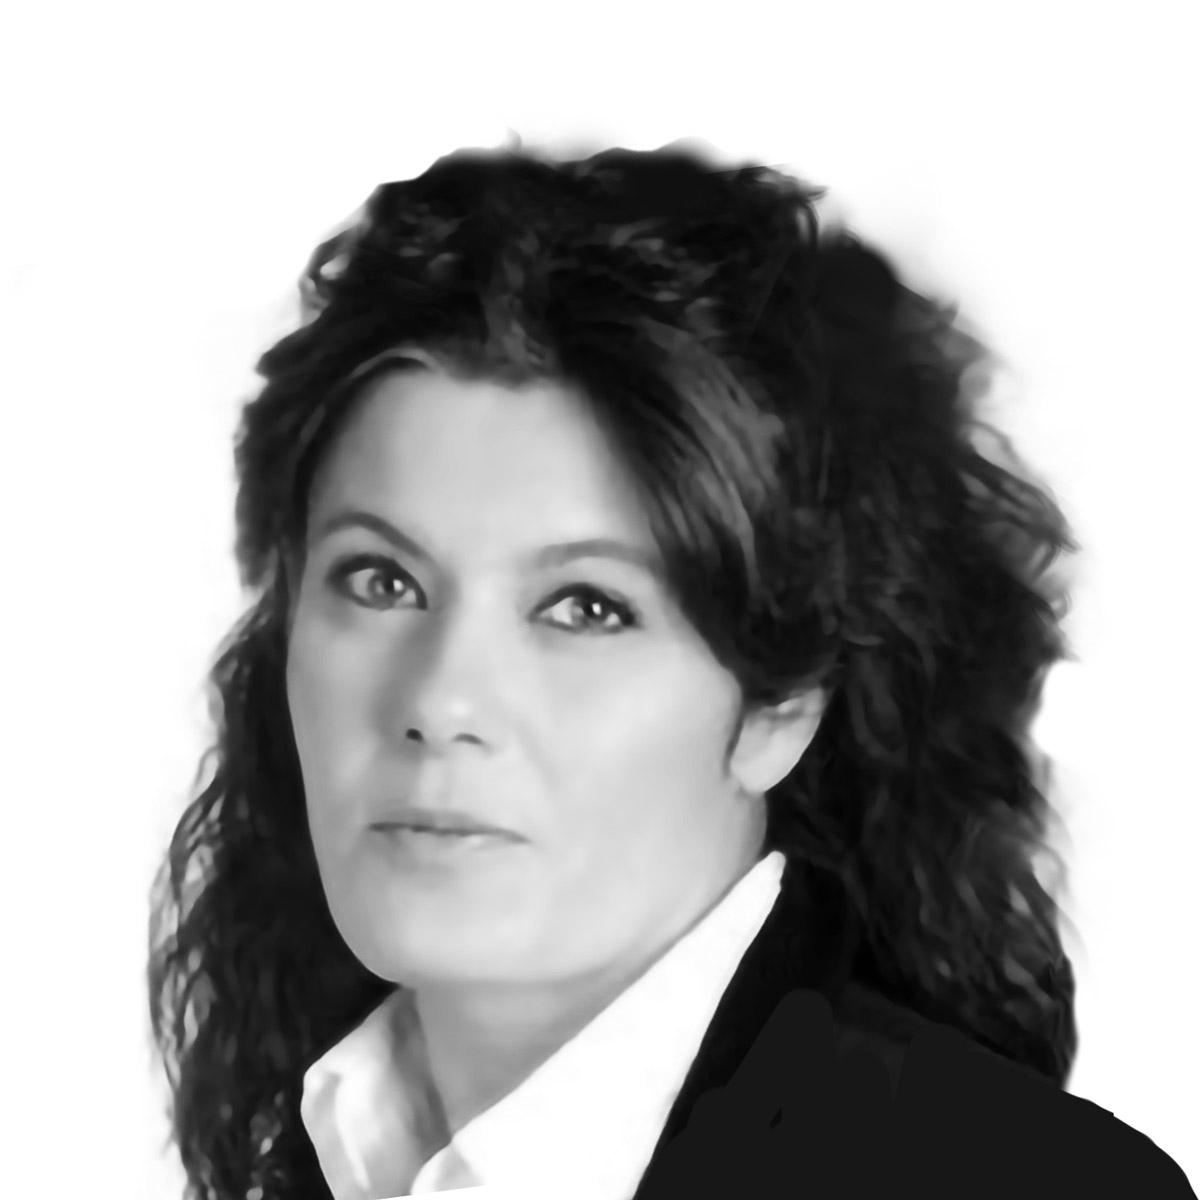 Giulia Arangüena UNIVERSITÀ DI PISA / UNIVERSITÀ DI TORINO Docente